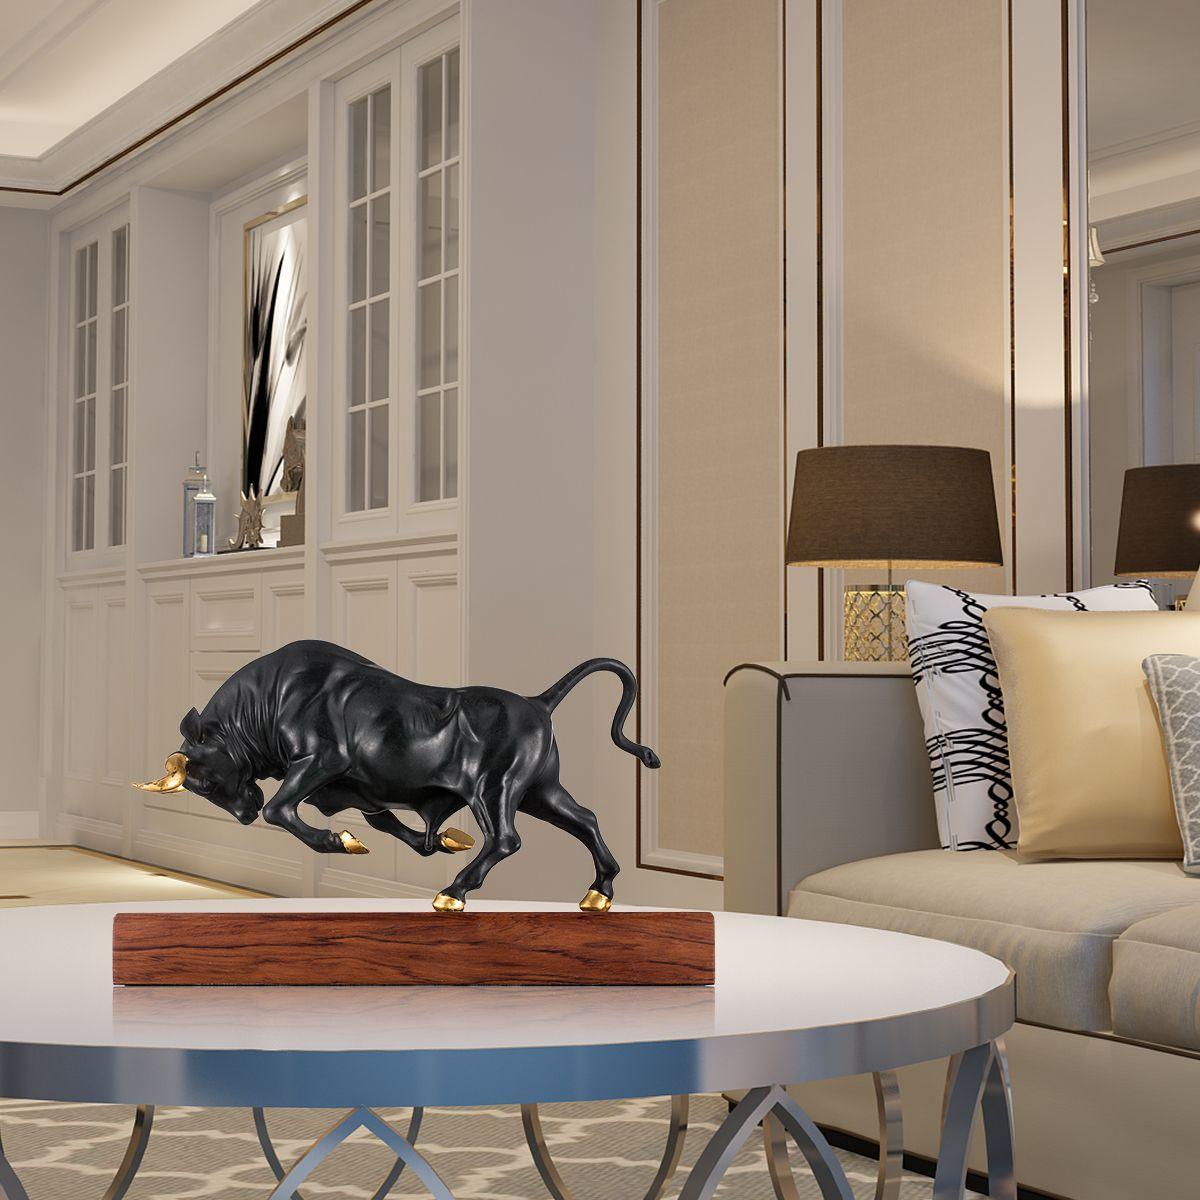 Reines Kupfer Moderne Kunstwerk Kräftige Bull Bronze Skulptur voller Dynamik Festigkeit Tier Skulptur Bull Exquisite Room Decor